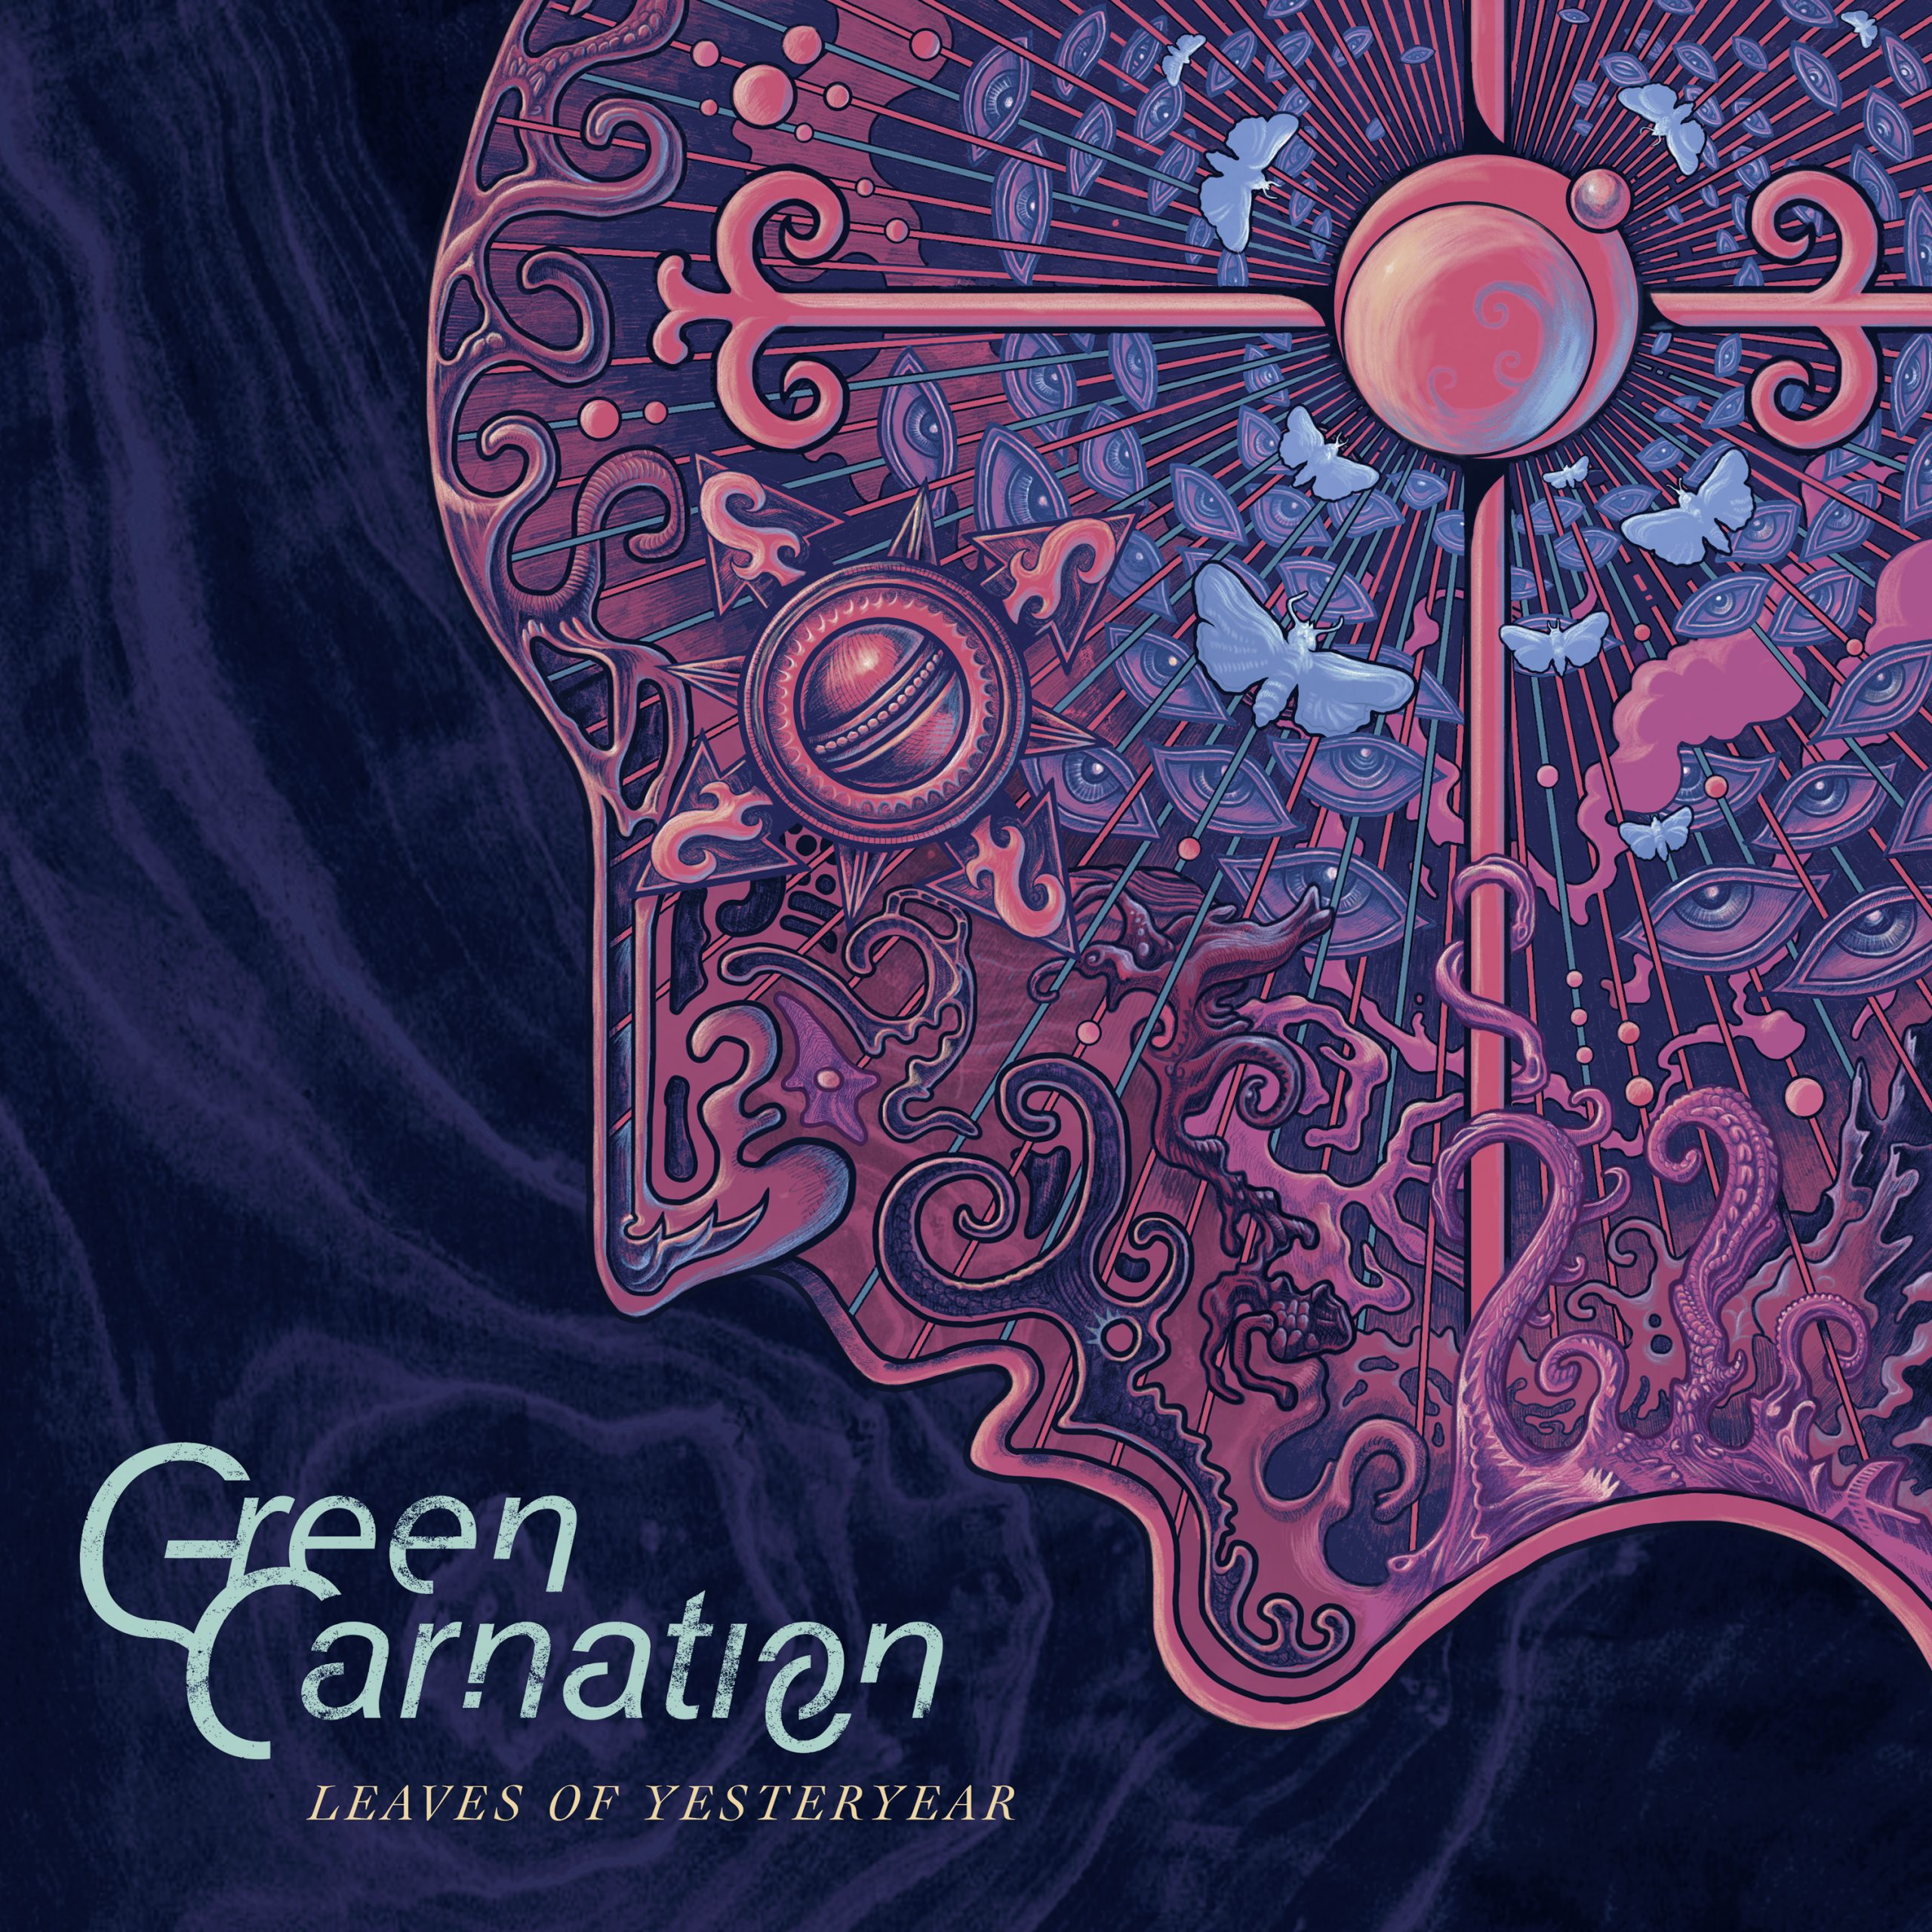 Green Carnation: Leaves of Yesteryear